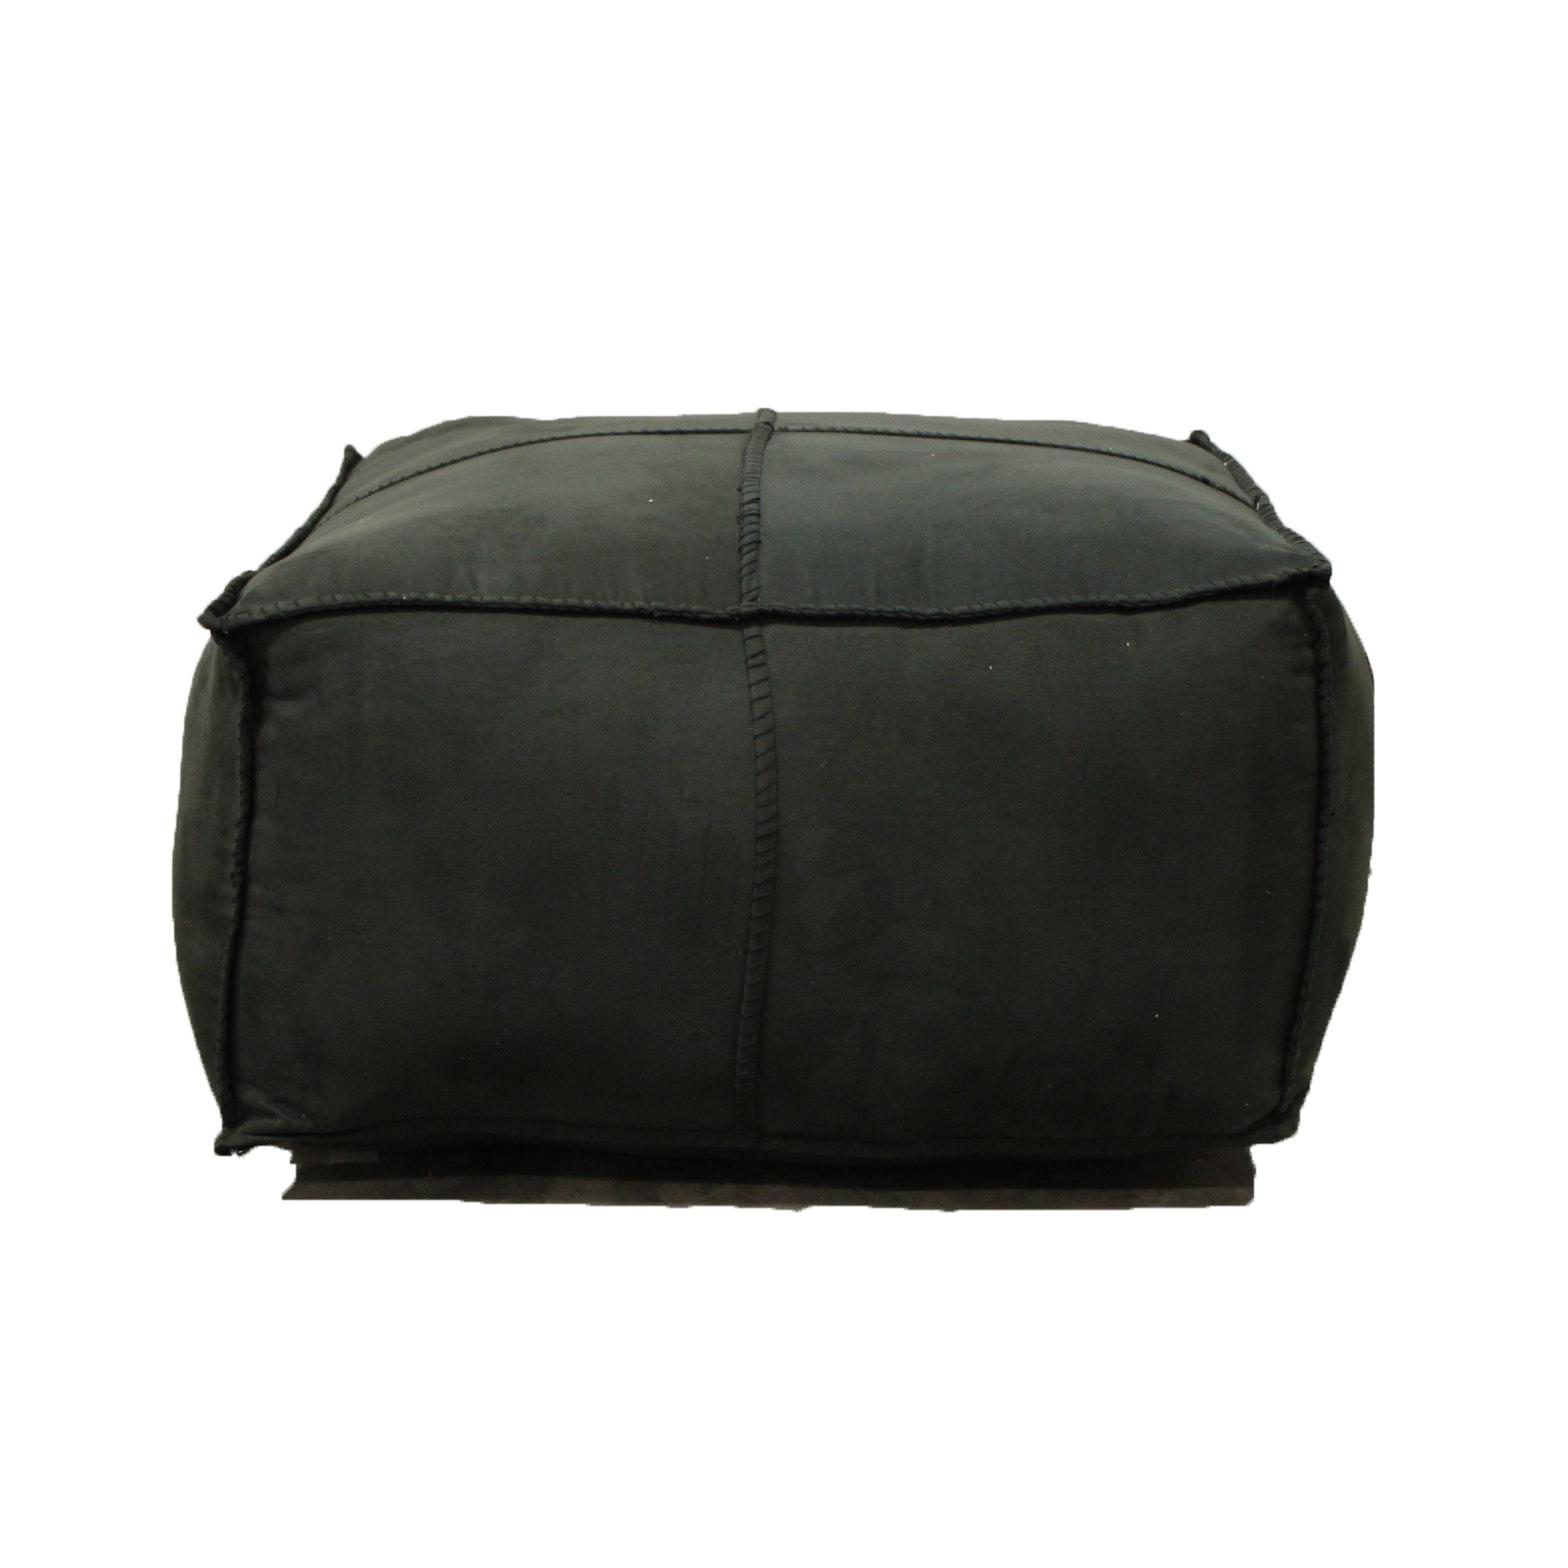 Upholstered Dark Gray Ottoman by Surya